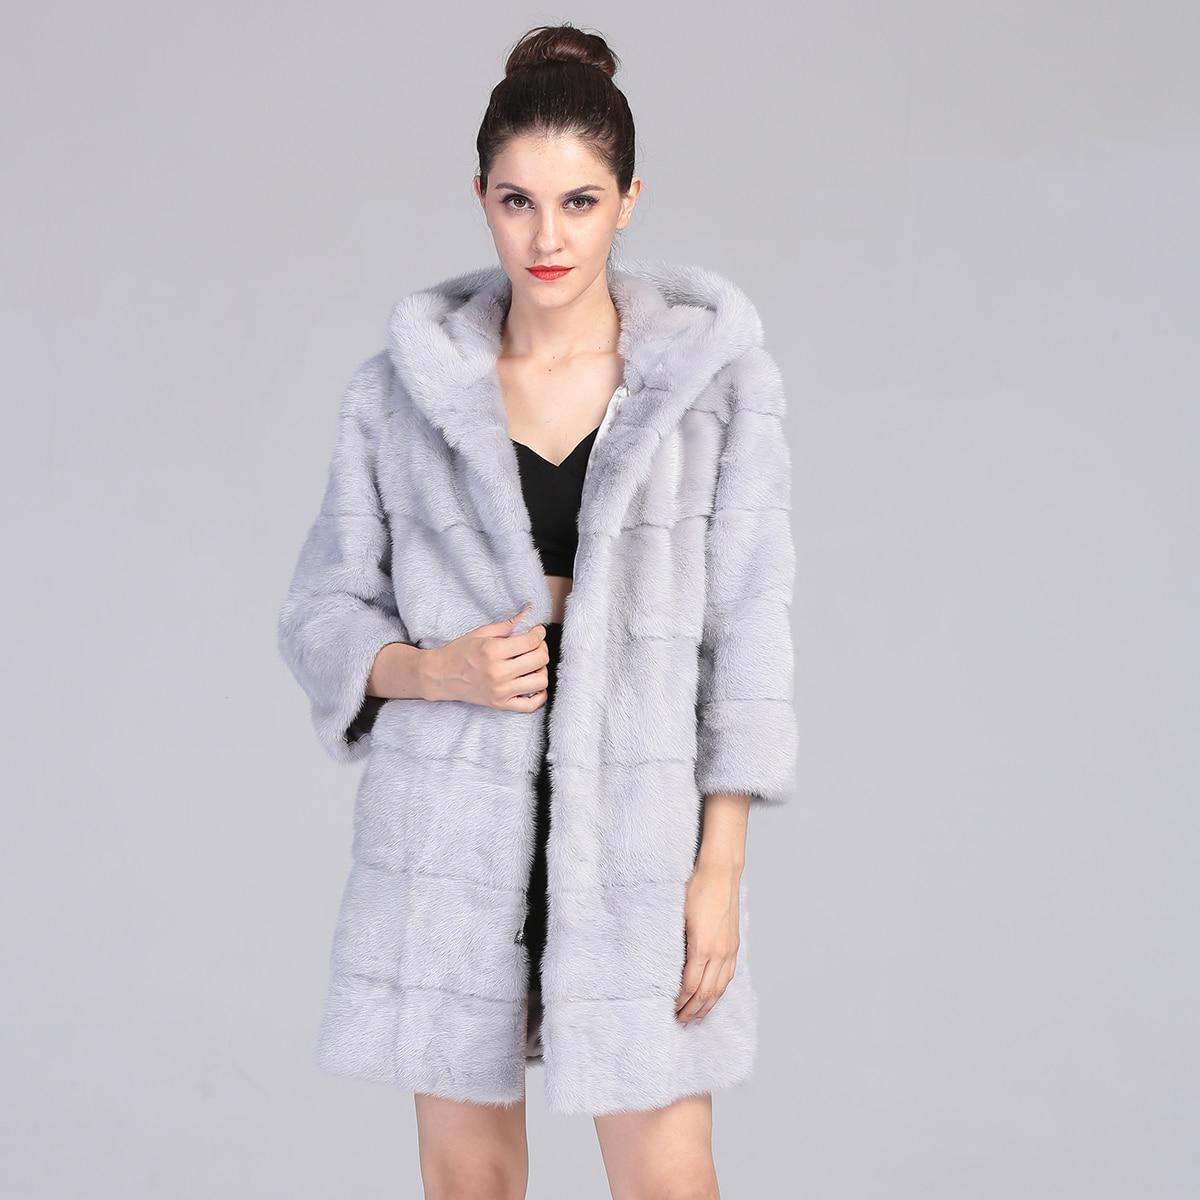 AAA Light Grey Long Mink Fur font b Jacket b font Natural Mink Fur Parka 2016